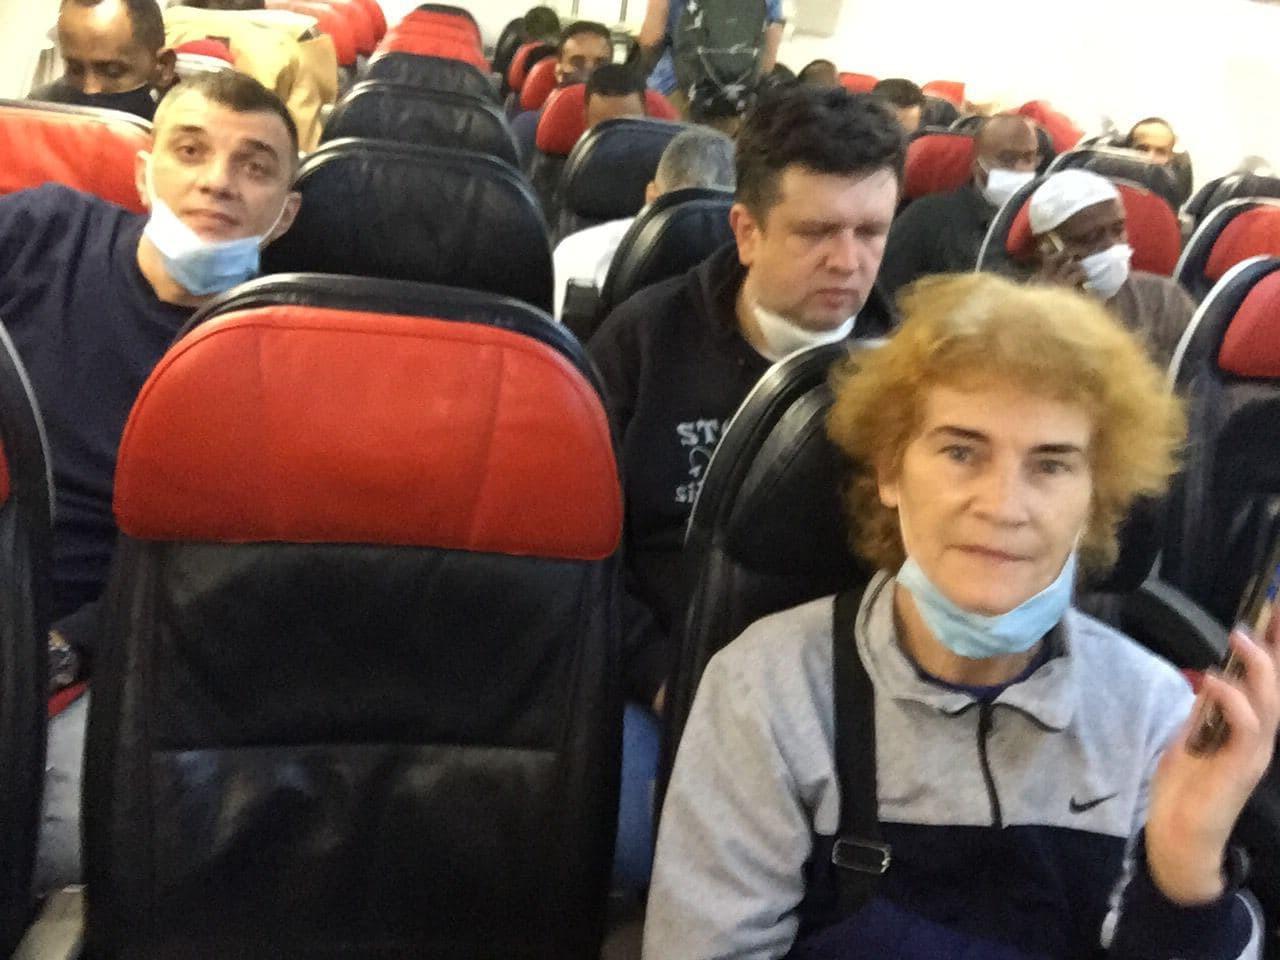 7Q7RU Malawi Team on the way to Kenya